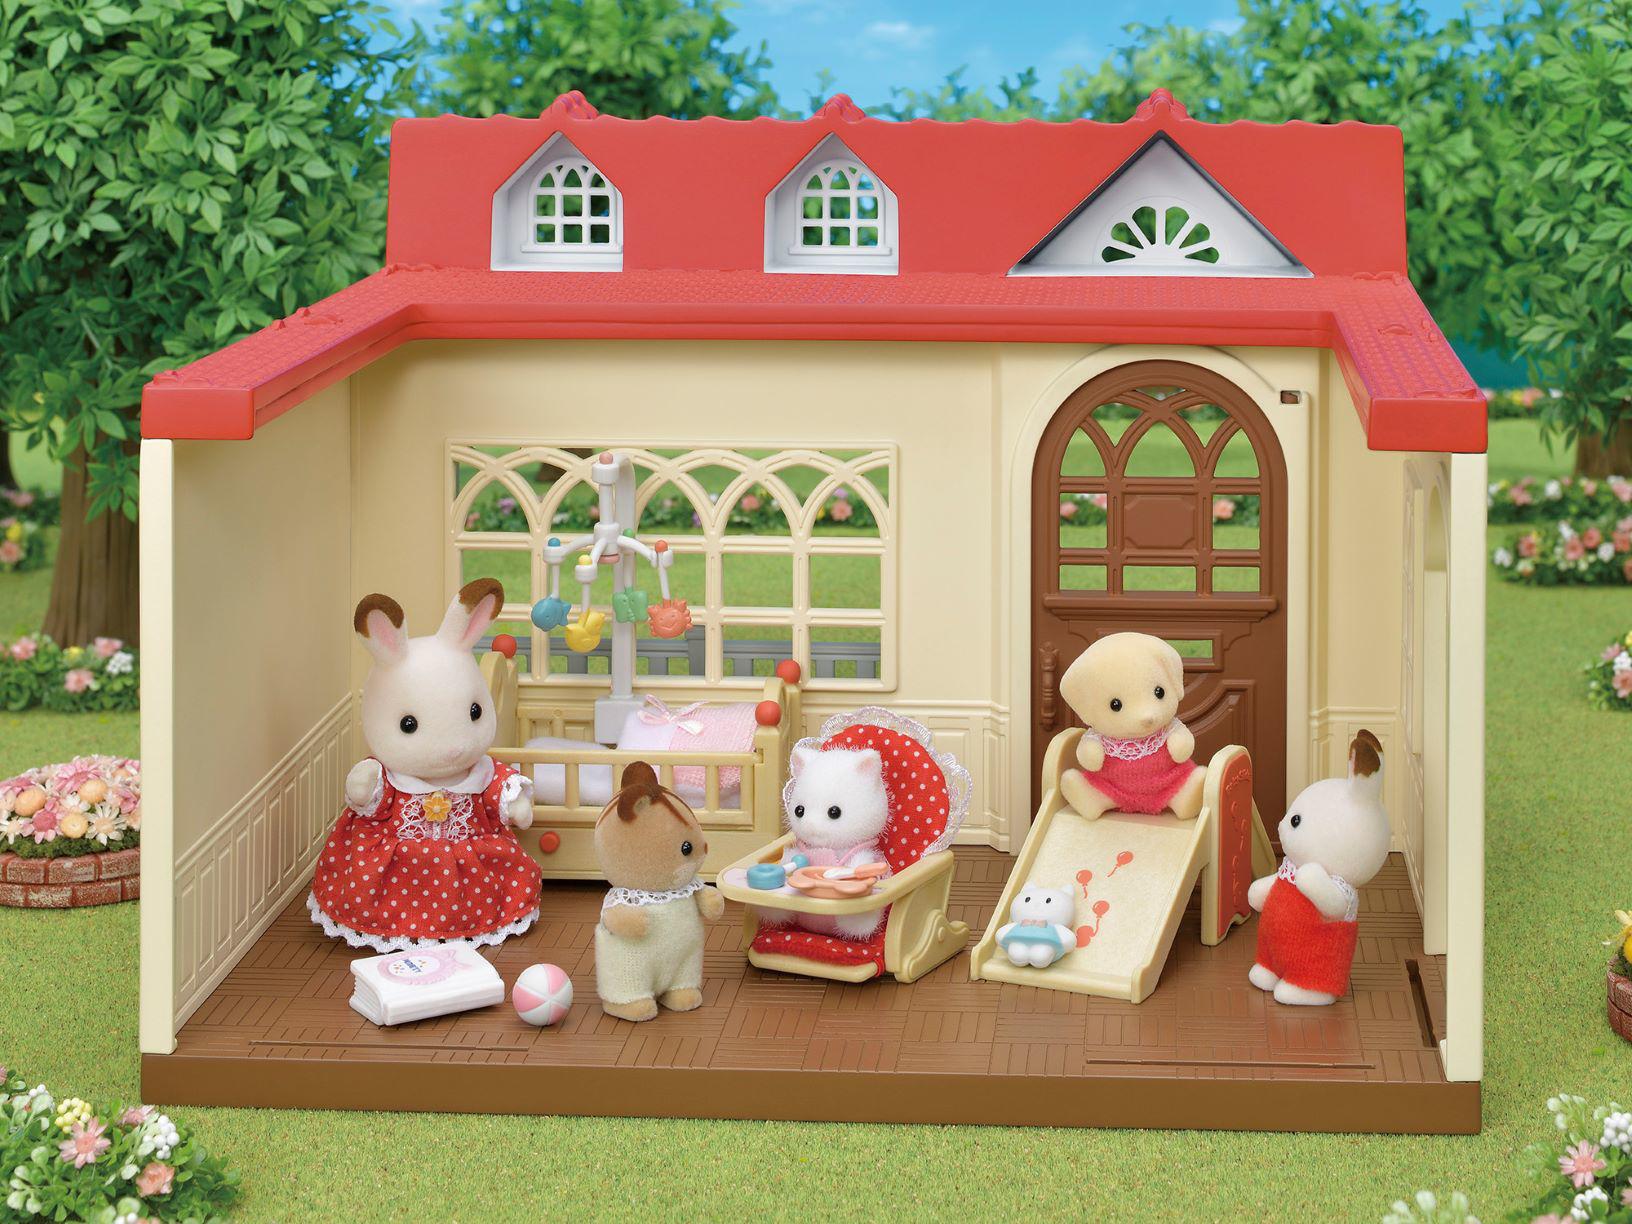 Sylvanian Families - Sweet Raspberry Home 5393